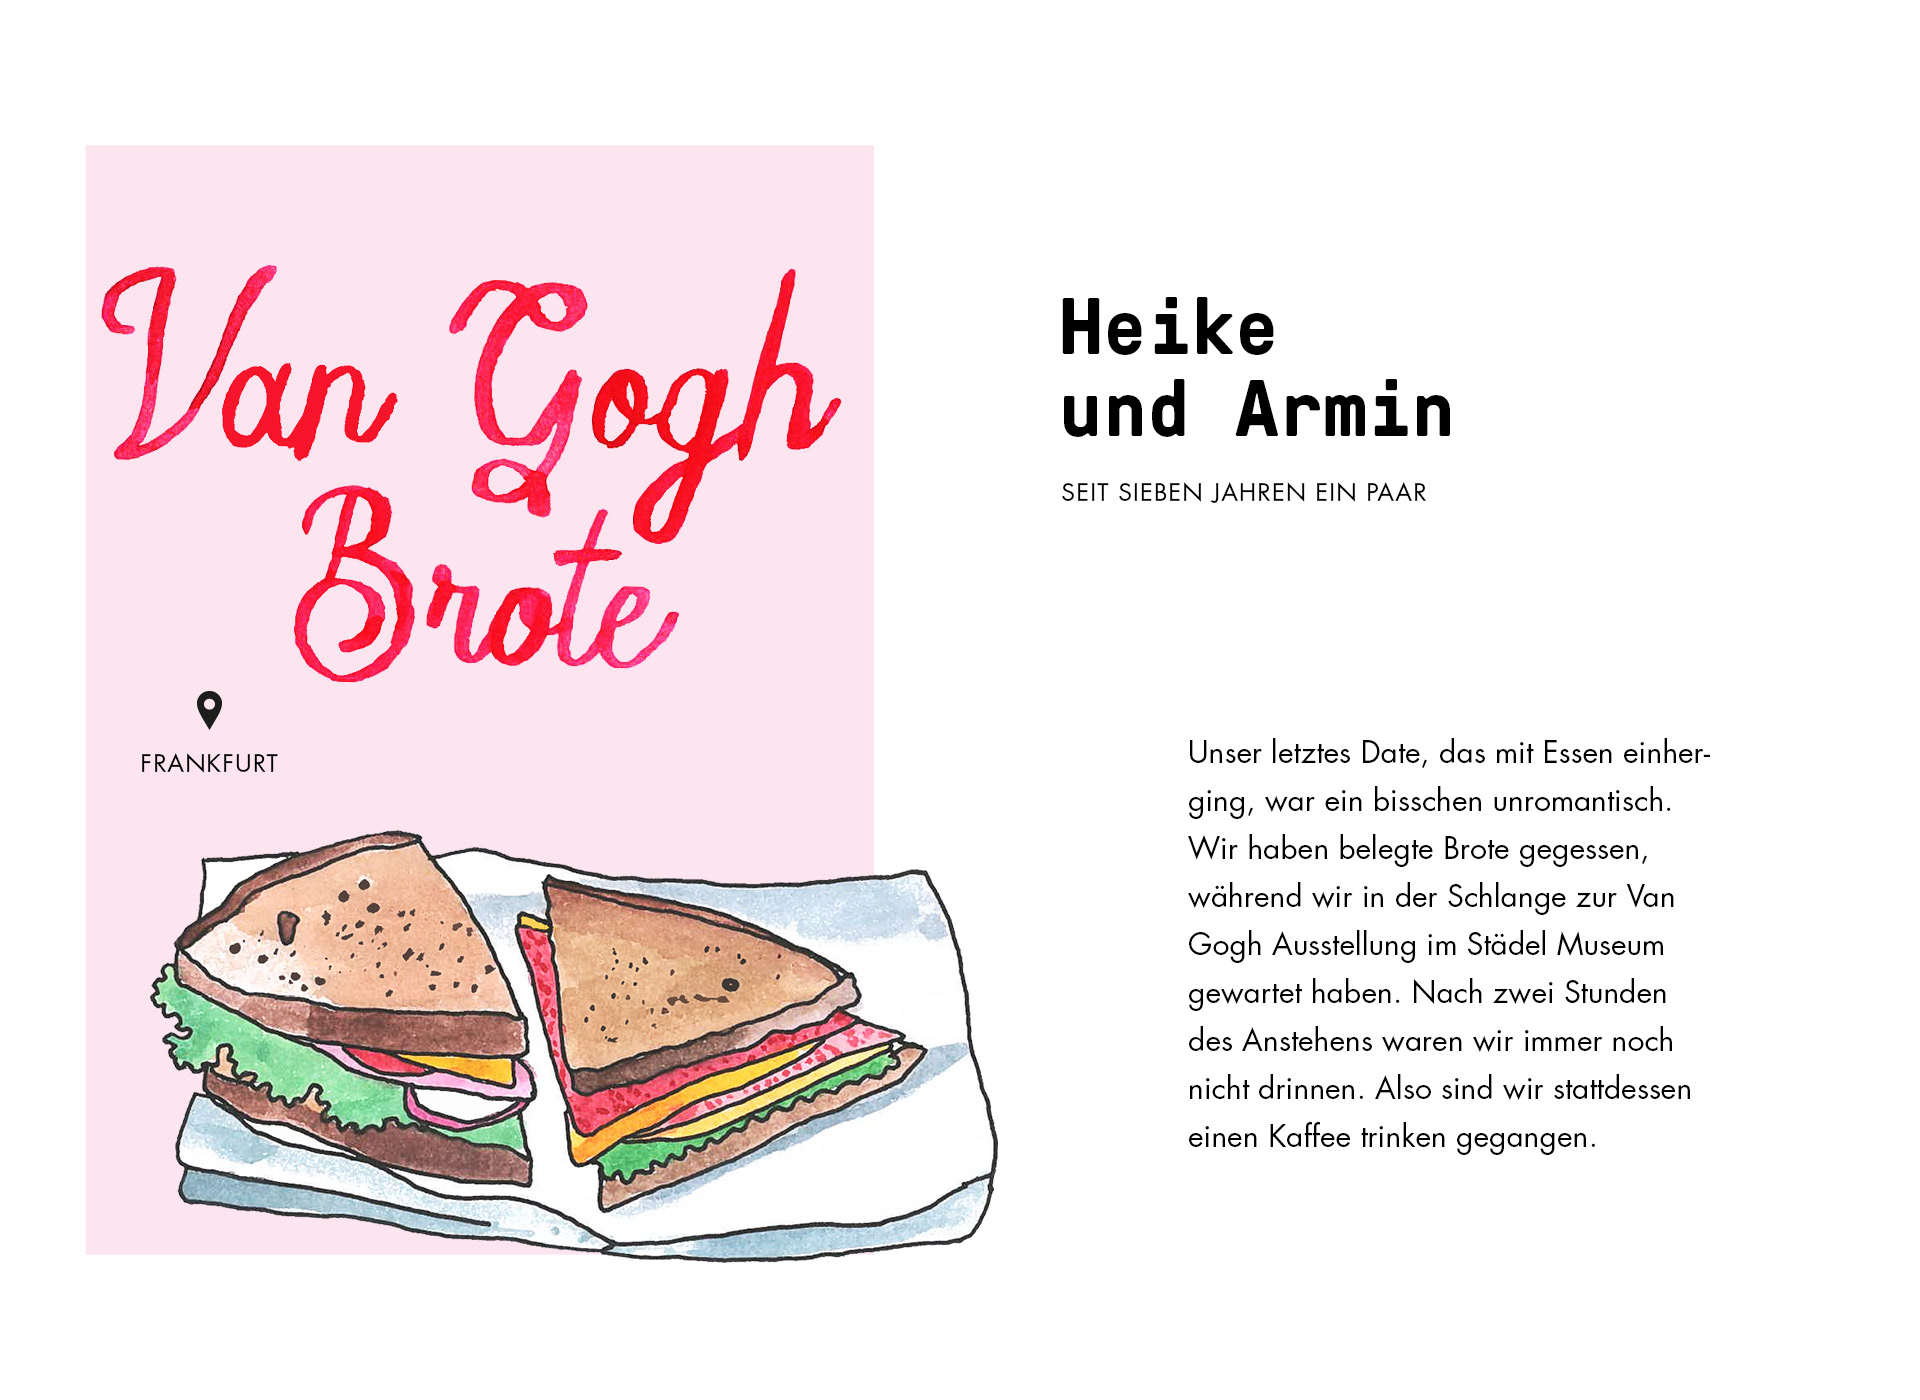 Silvie_Bomhard_personal_Project_Greta_Horsch_2